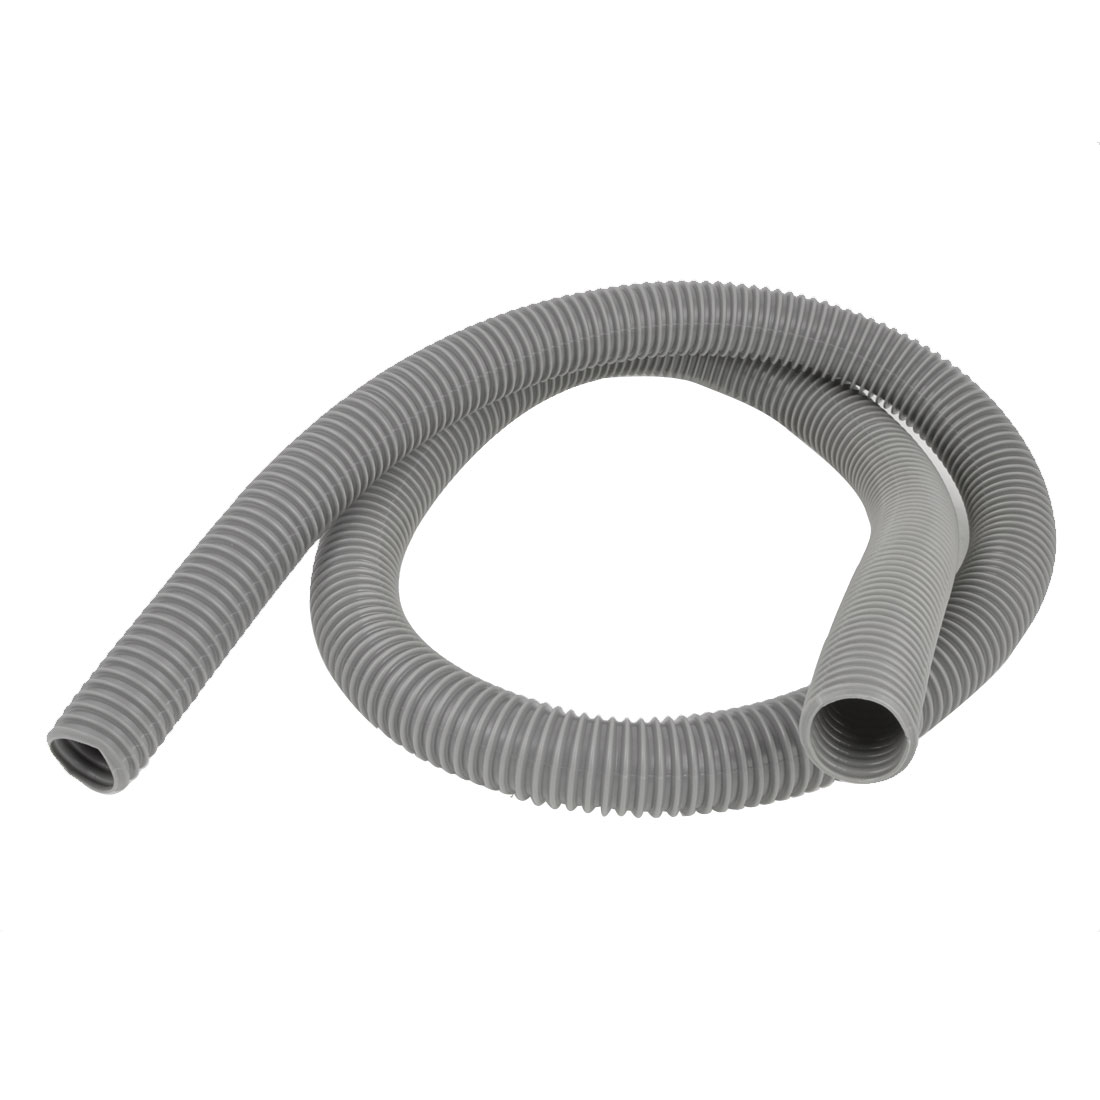 Home 40mm Outer Diameter Vacuum Cleaner PVC Hose Tube Pipe 1.9M Long